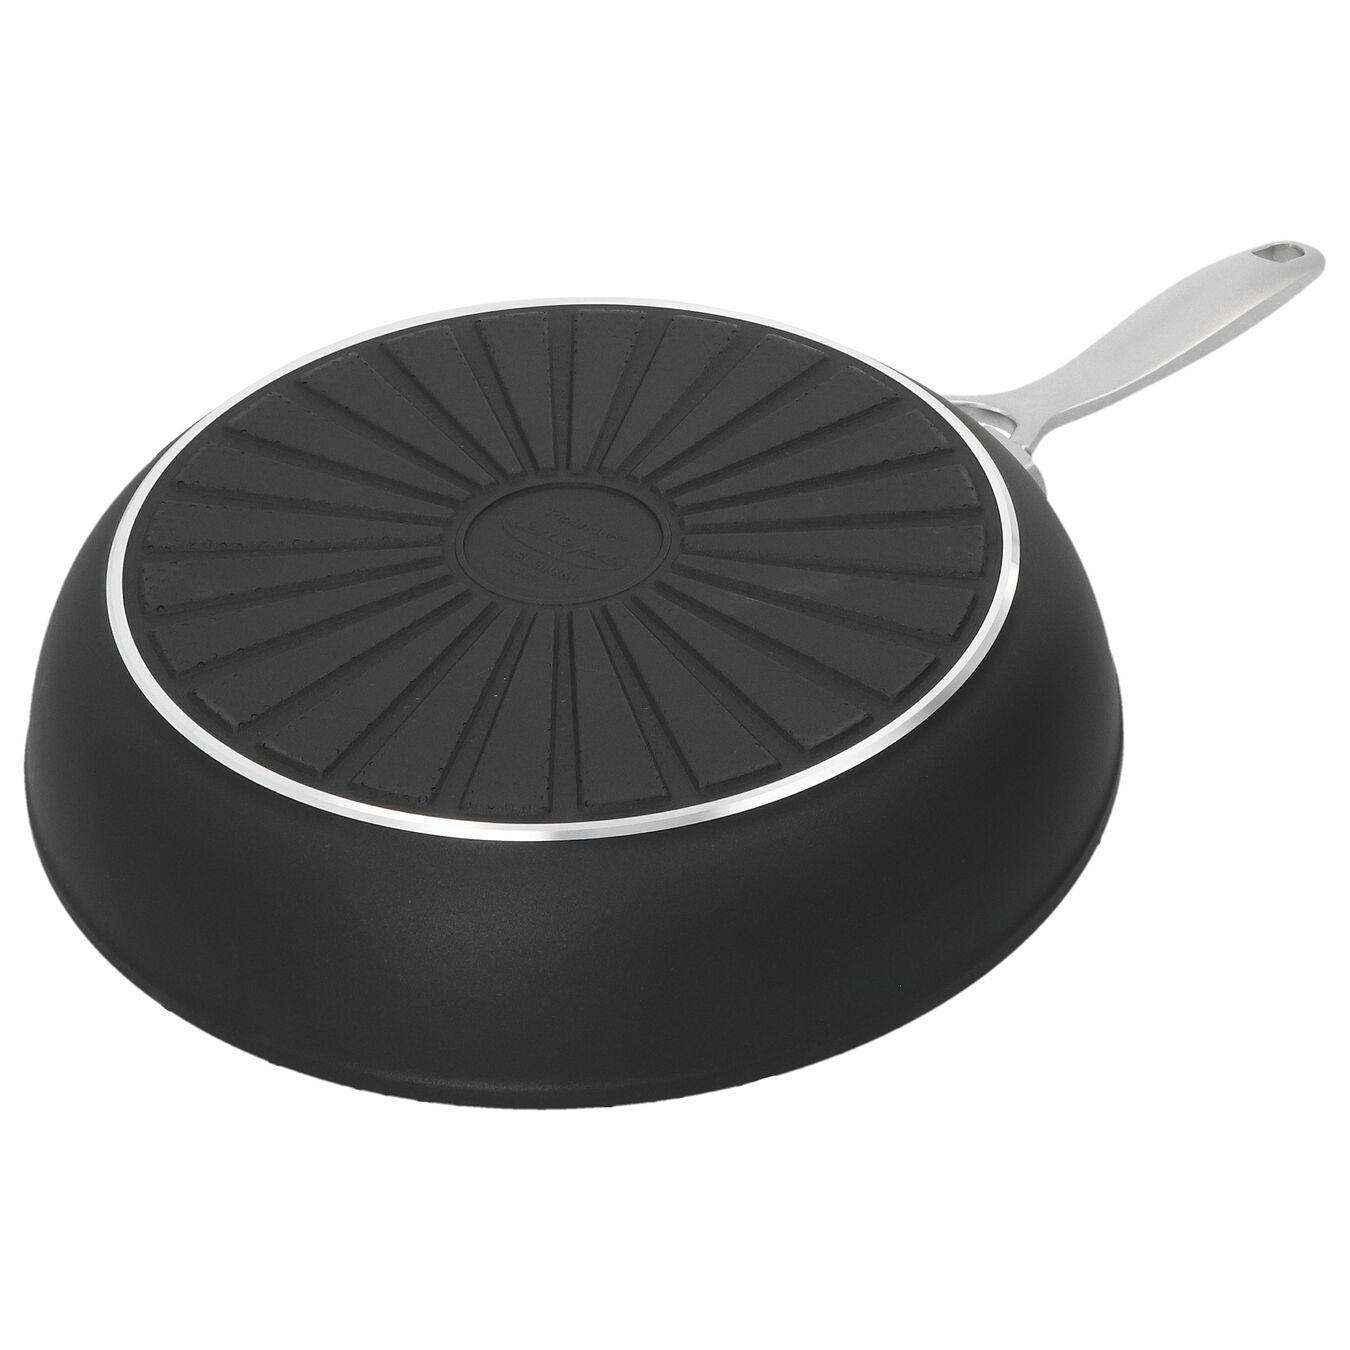 9.5-inch, Aluminium, Non-stick, Frying pan,,large 3